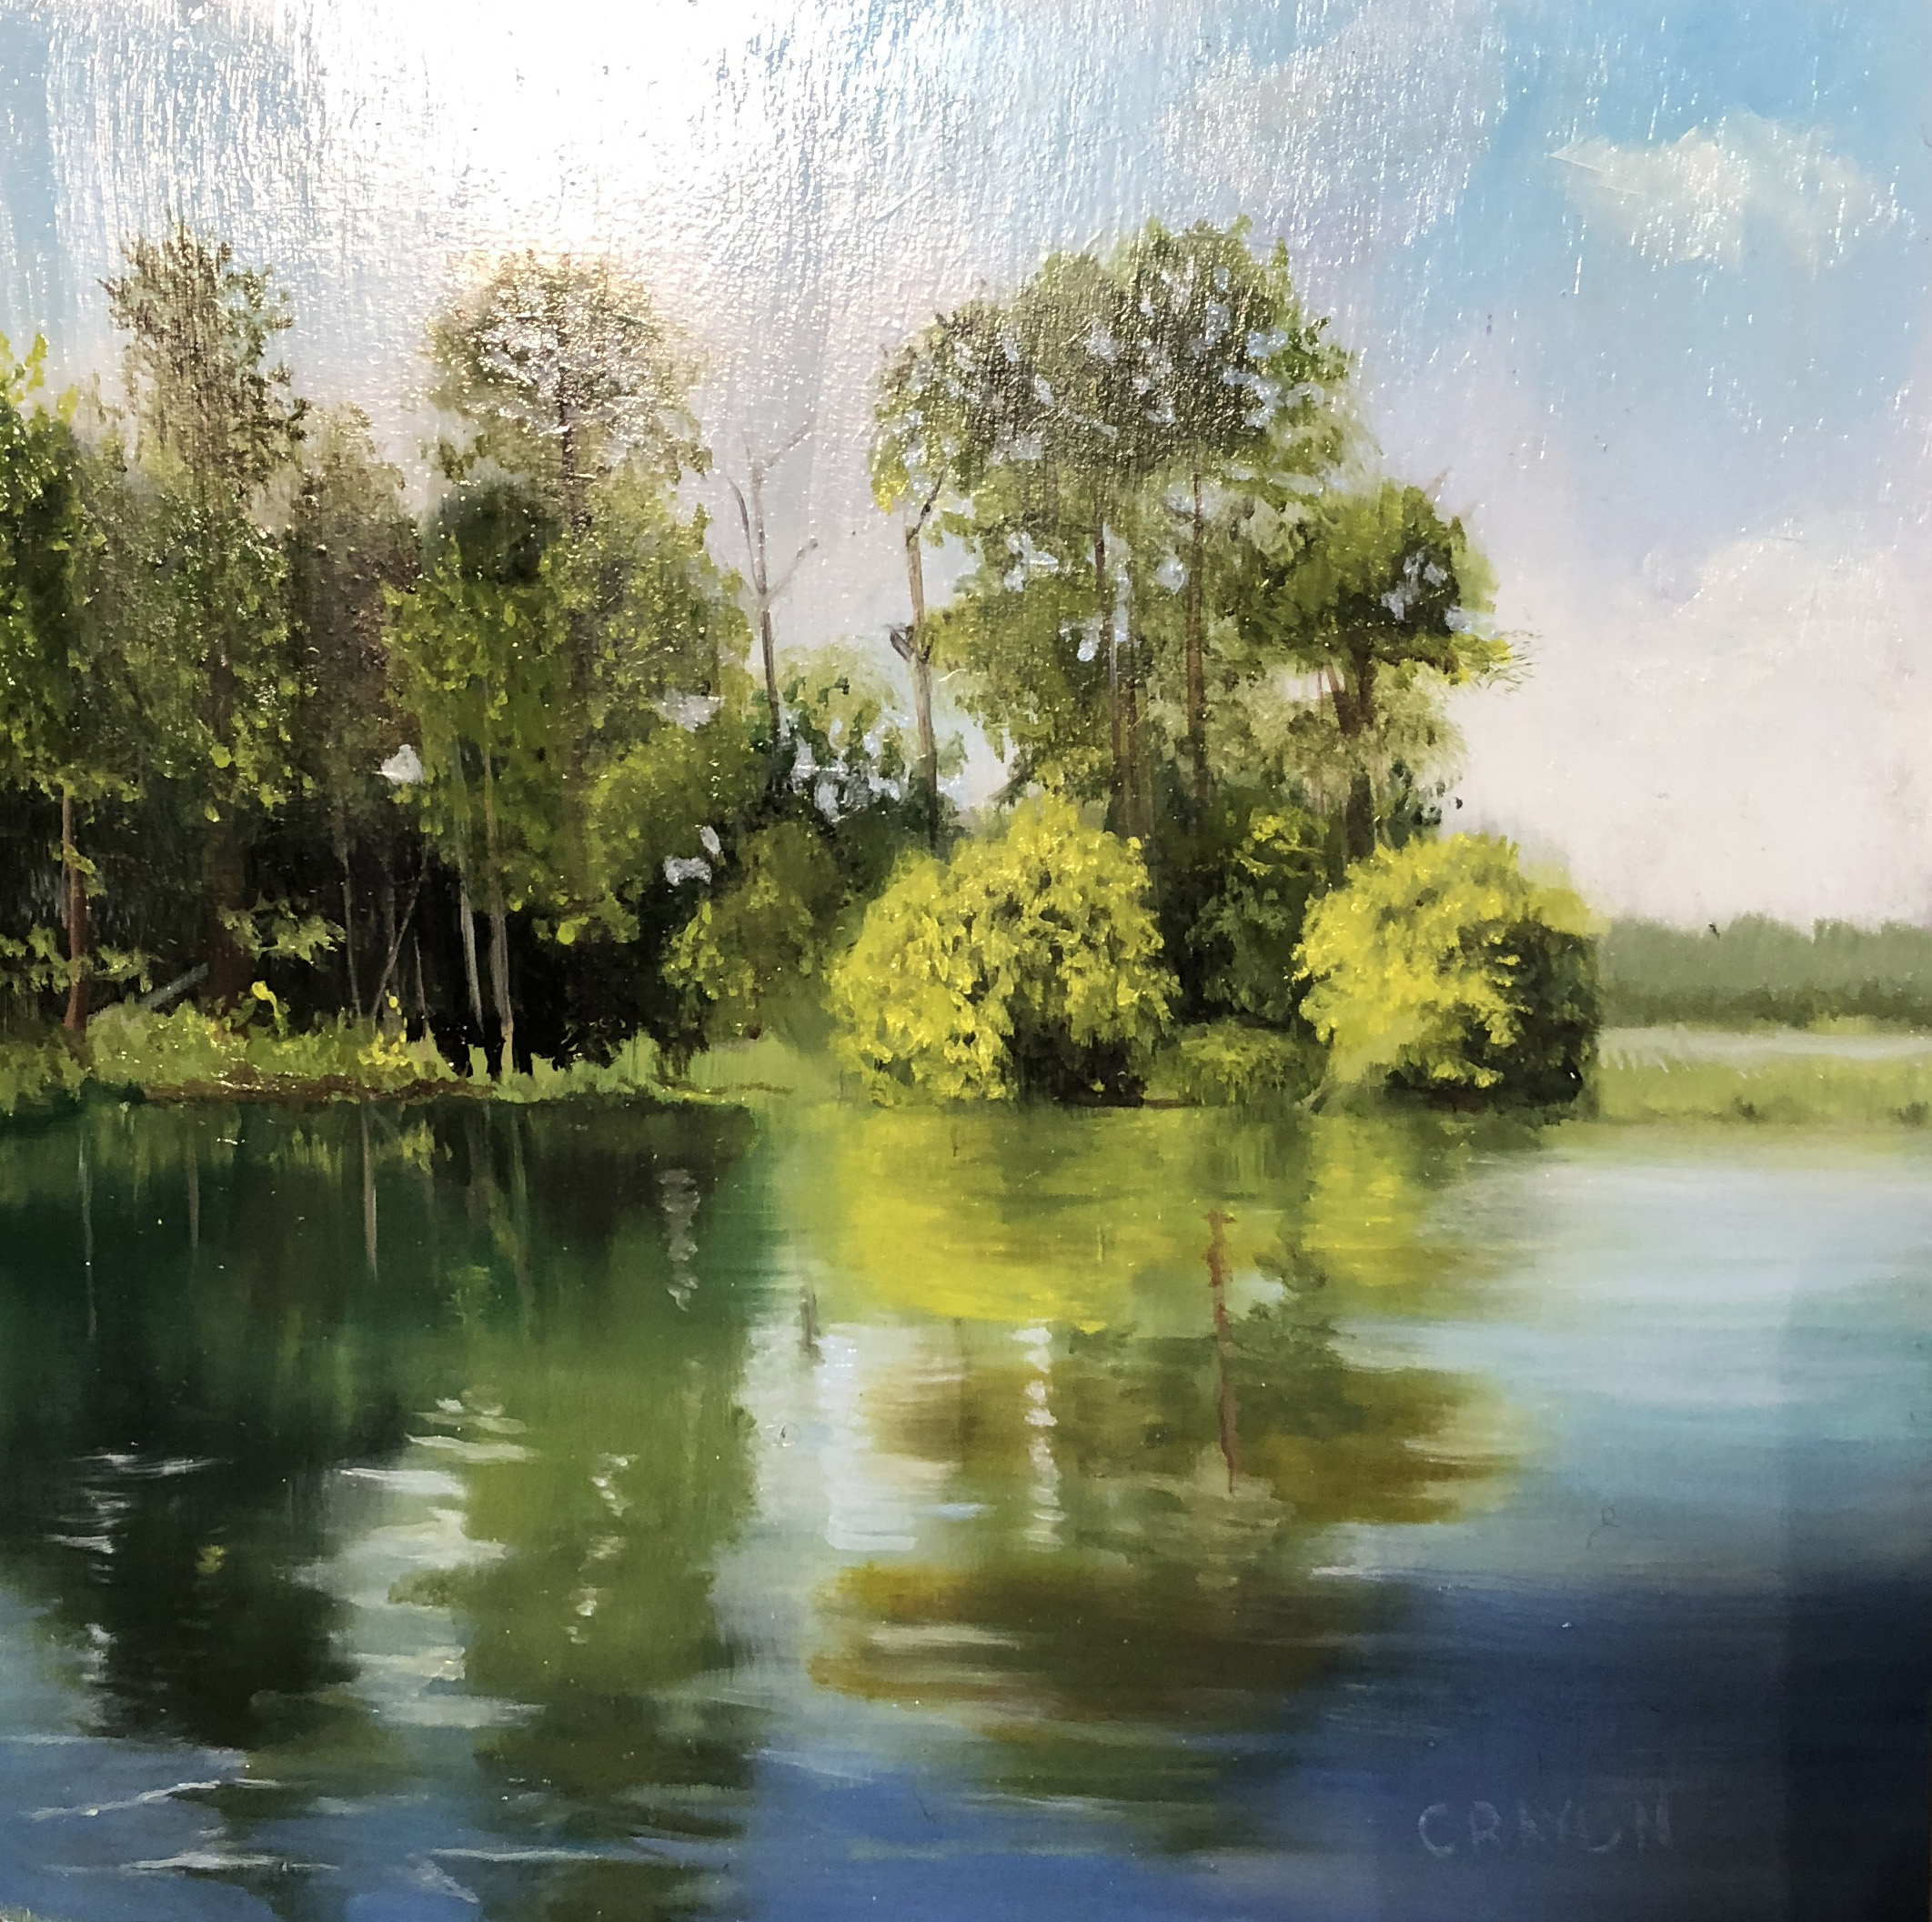 Dennis-Crayon-Green-Reflection-8x8-oil-on-Panel.jpg